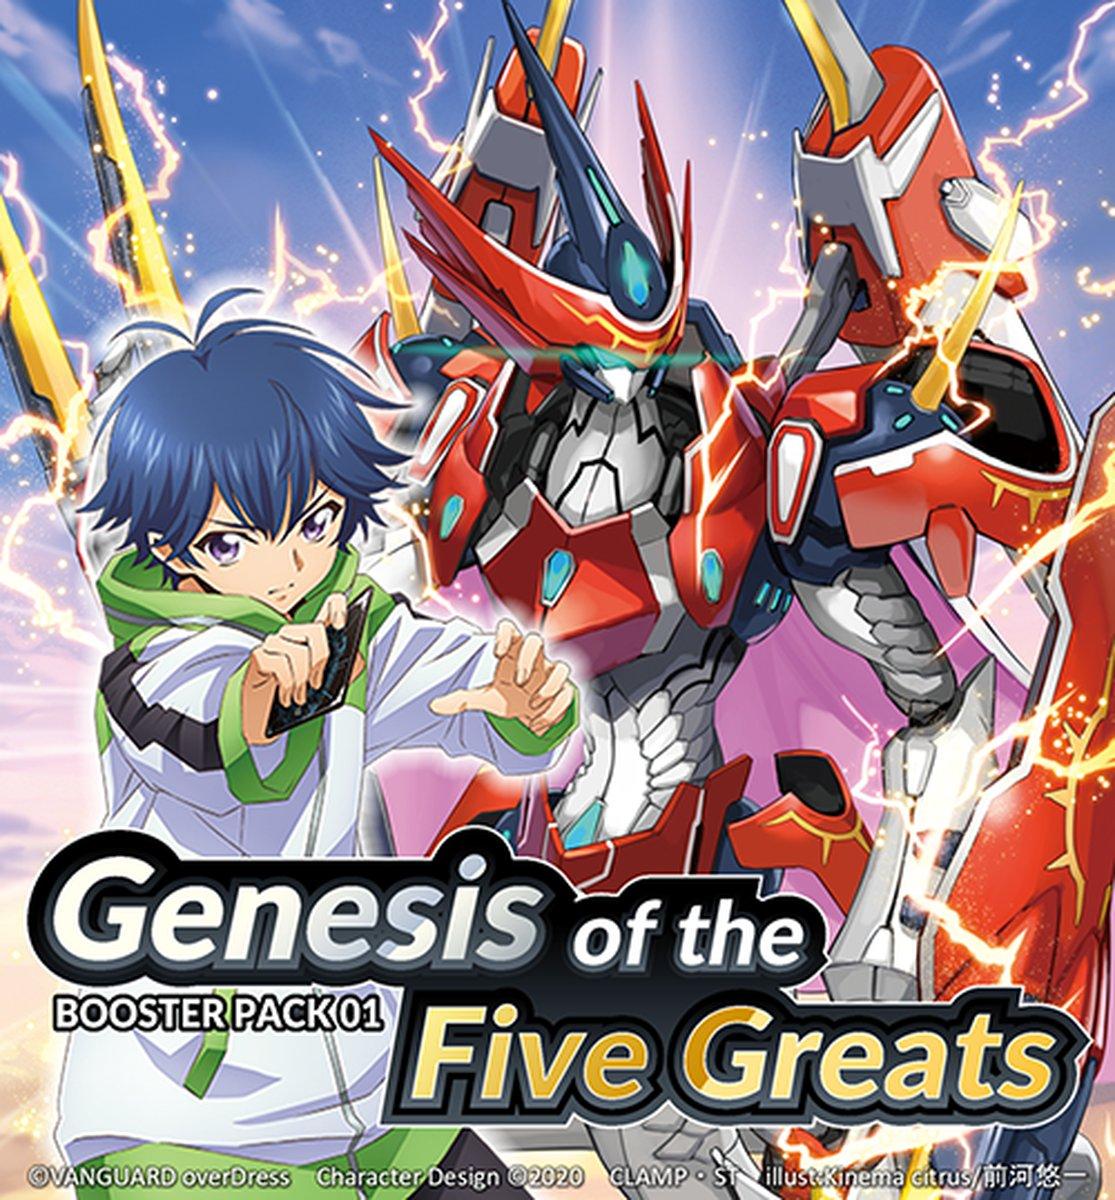 Boite de 16 Boosters Genesis of the Five Greats (D-BT01)